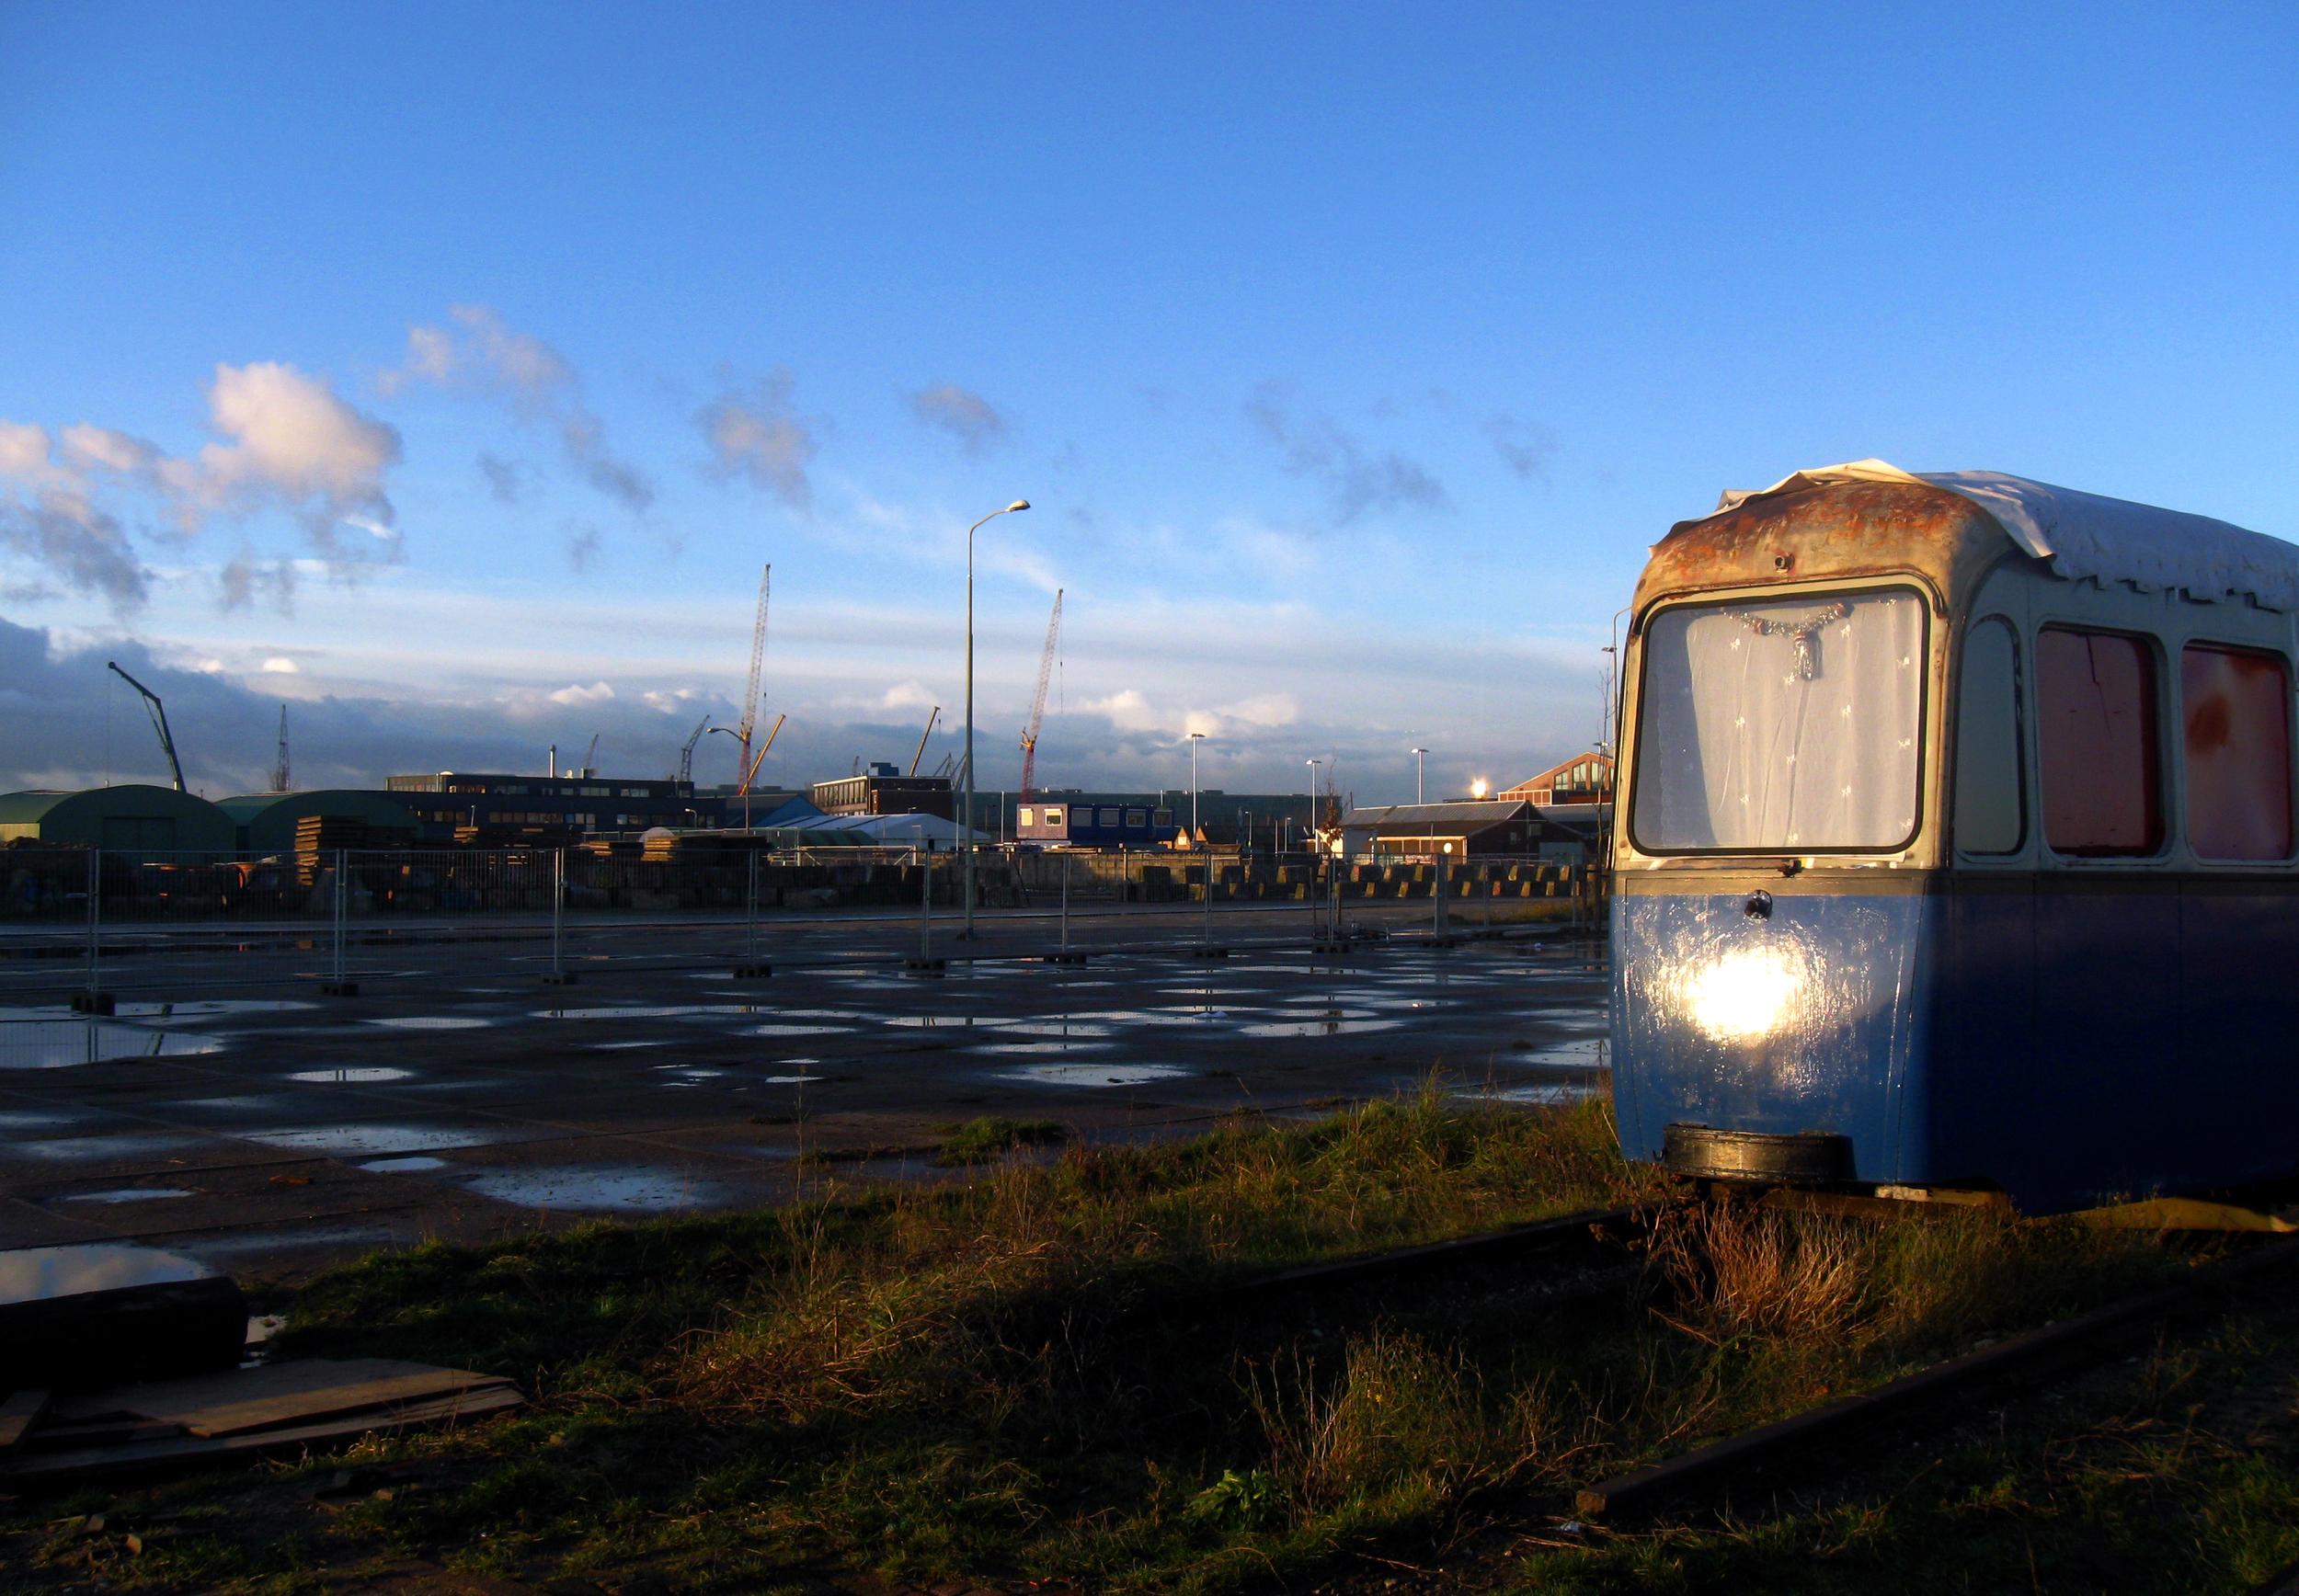 The Abandoned Tram Suburb.jpg